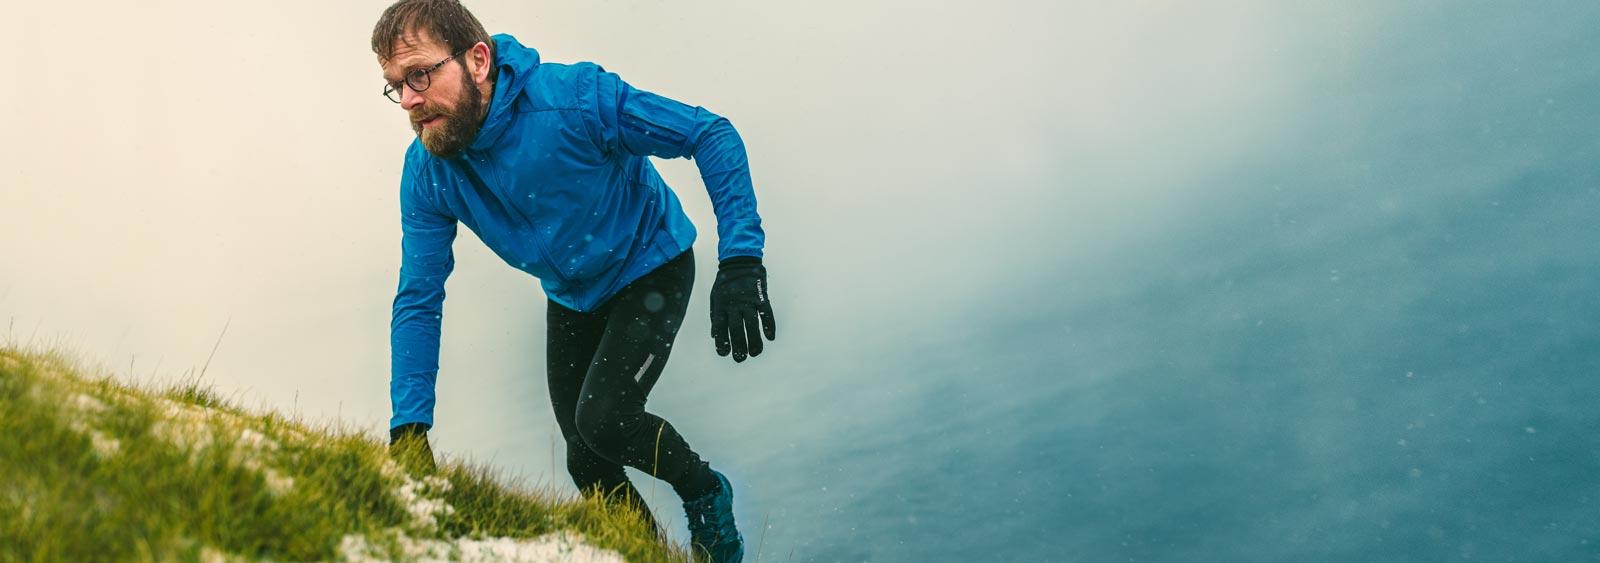 pastor running up a hill